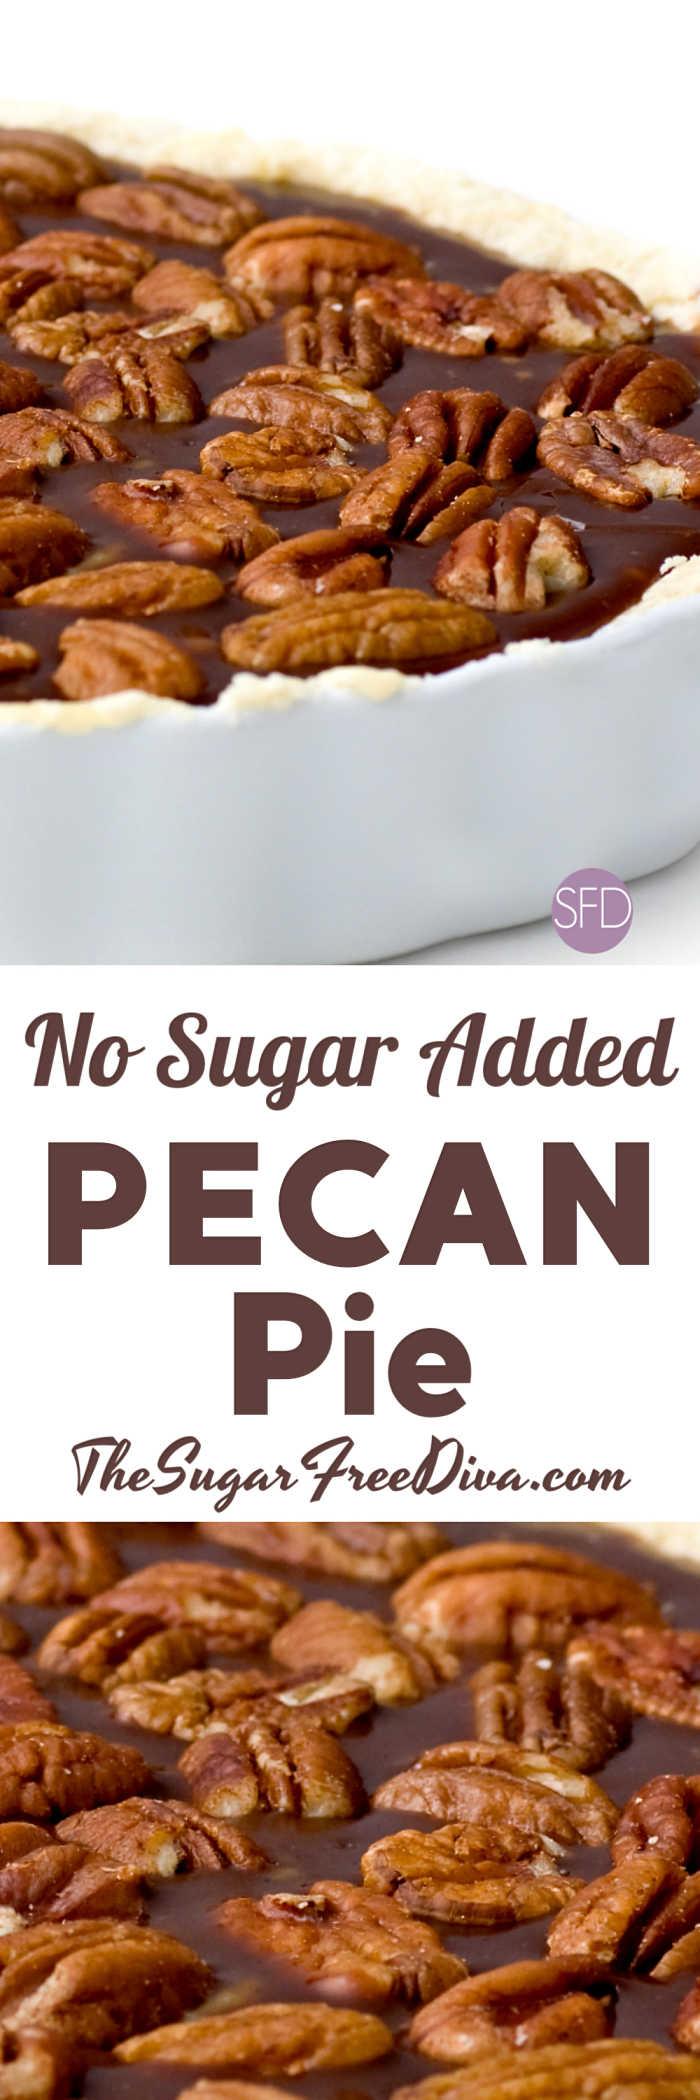 No Sugar Added Pecan Pie